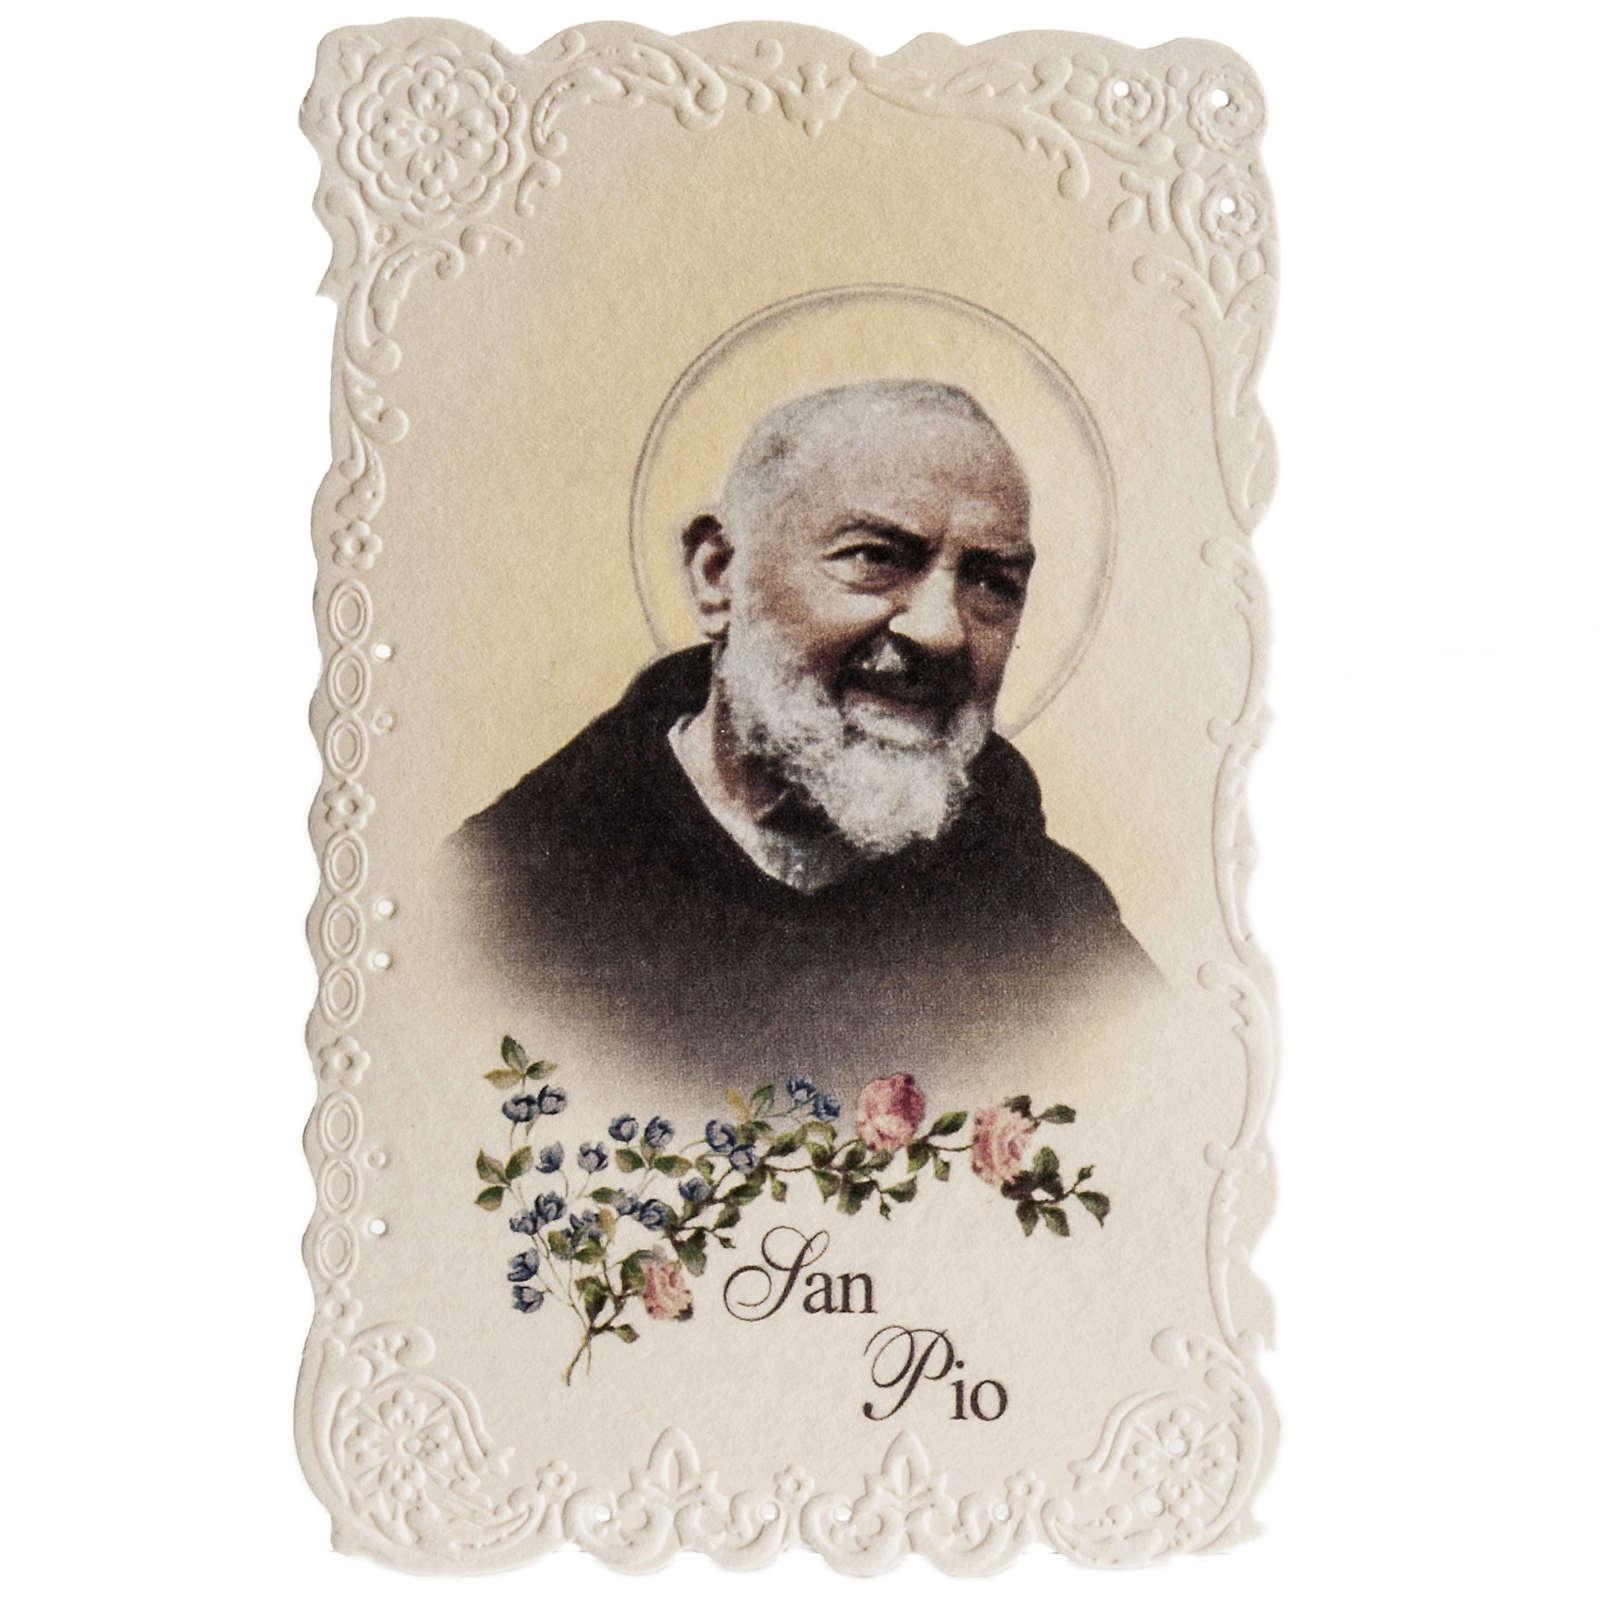 Estampa San Pio da Pietrelcina con oración (italia 4